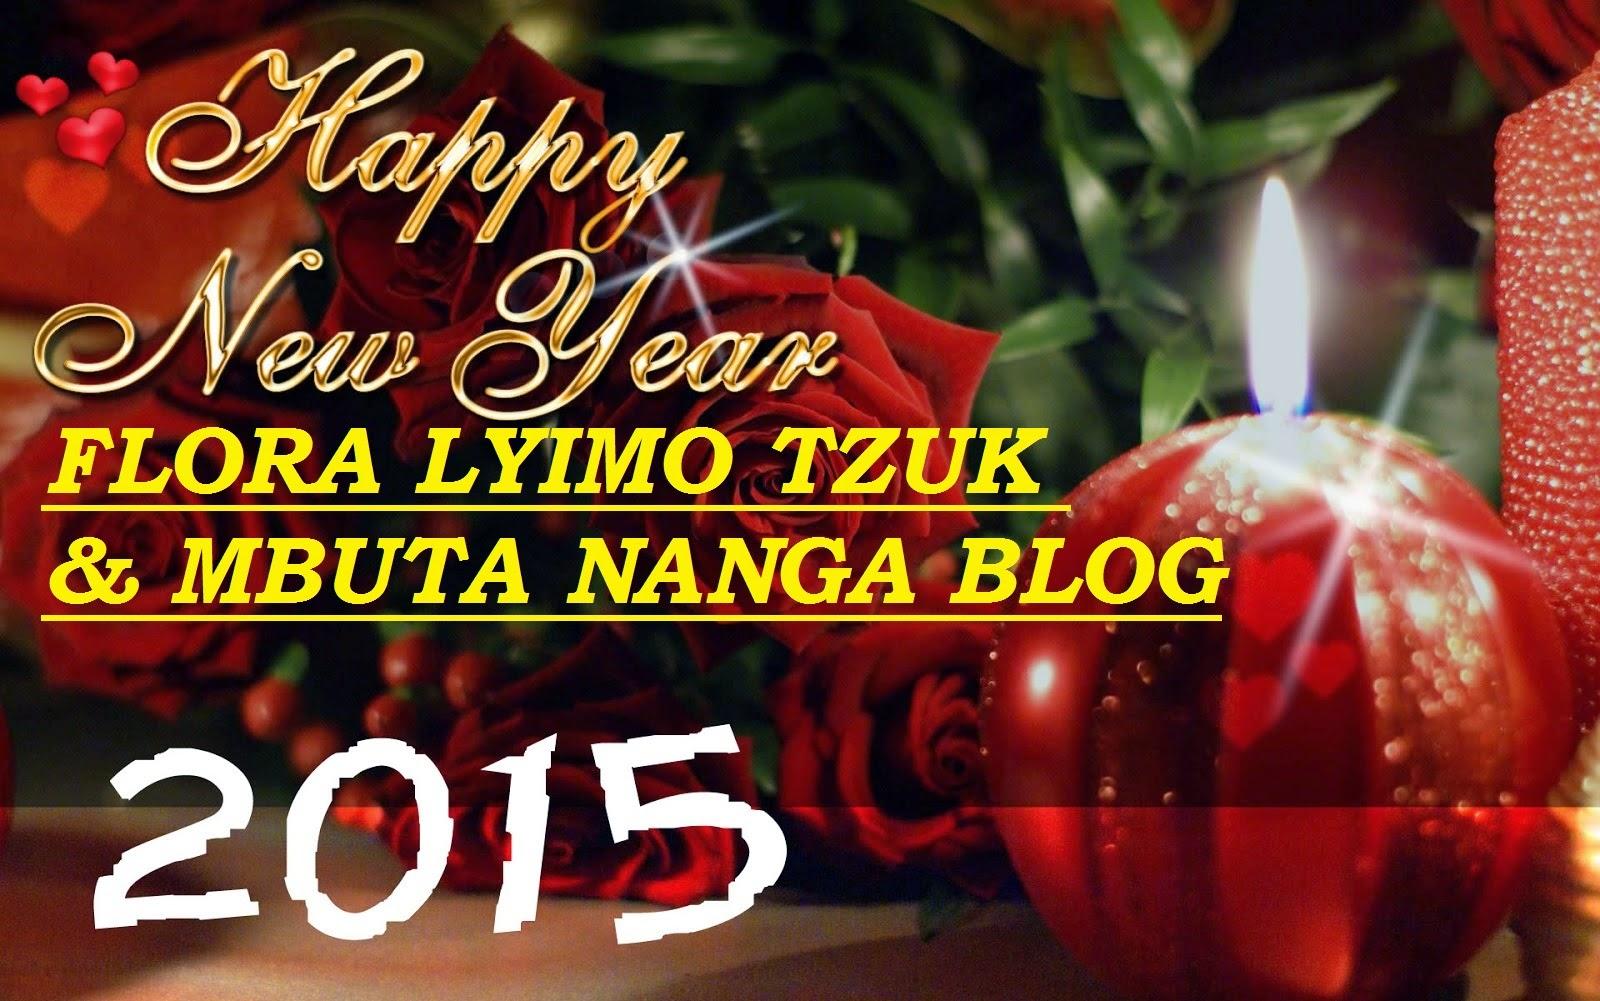 FLORA EW YEAR